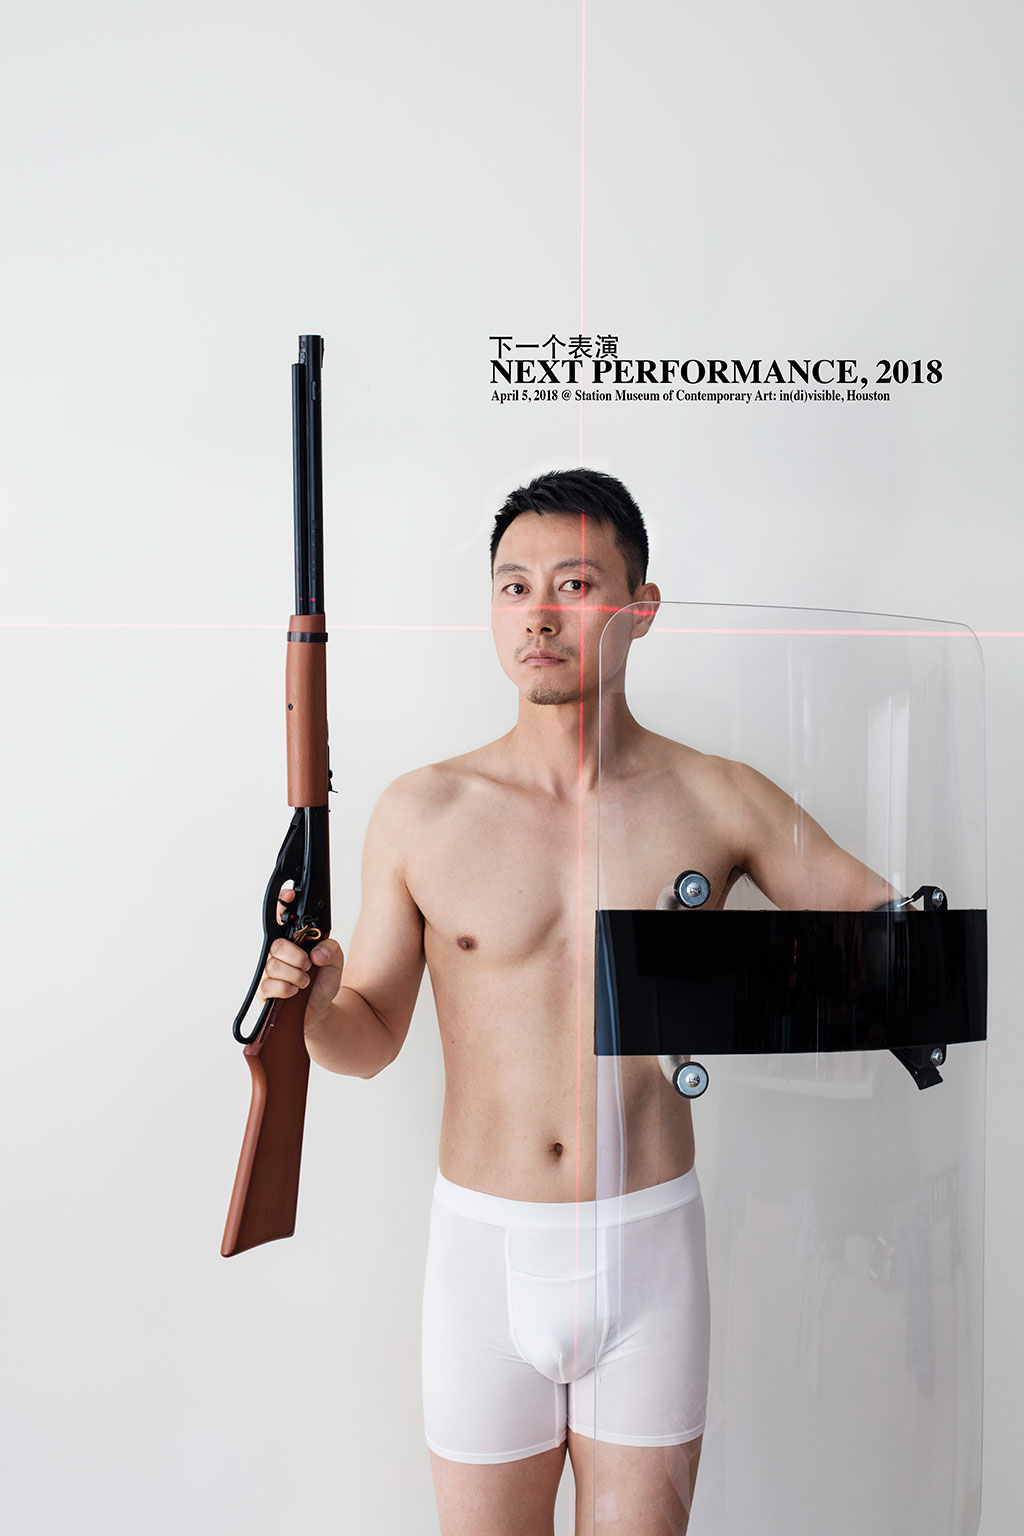 Next Performance, 2018 by Miao Jiaxin